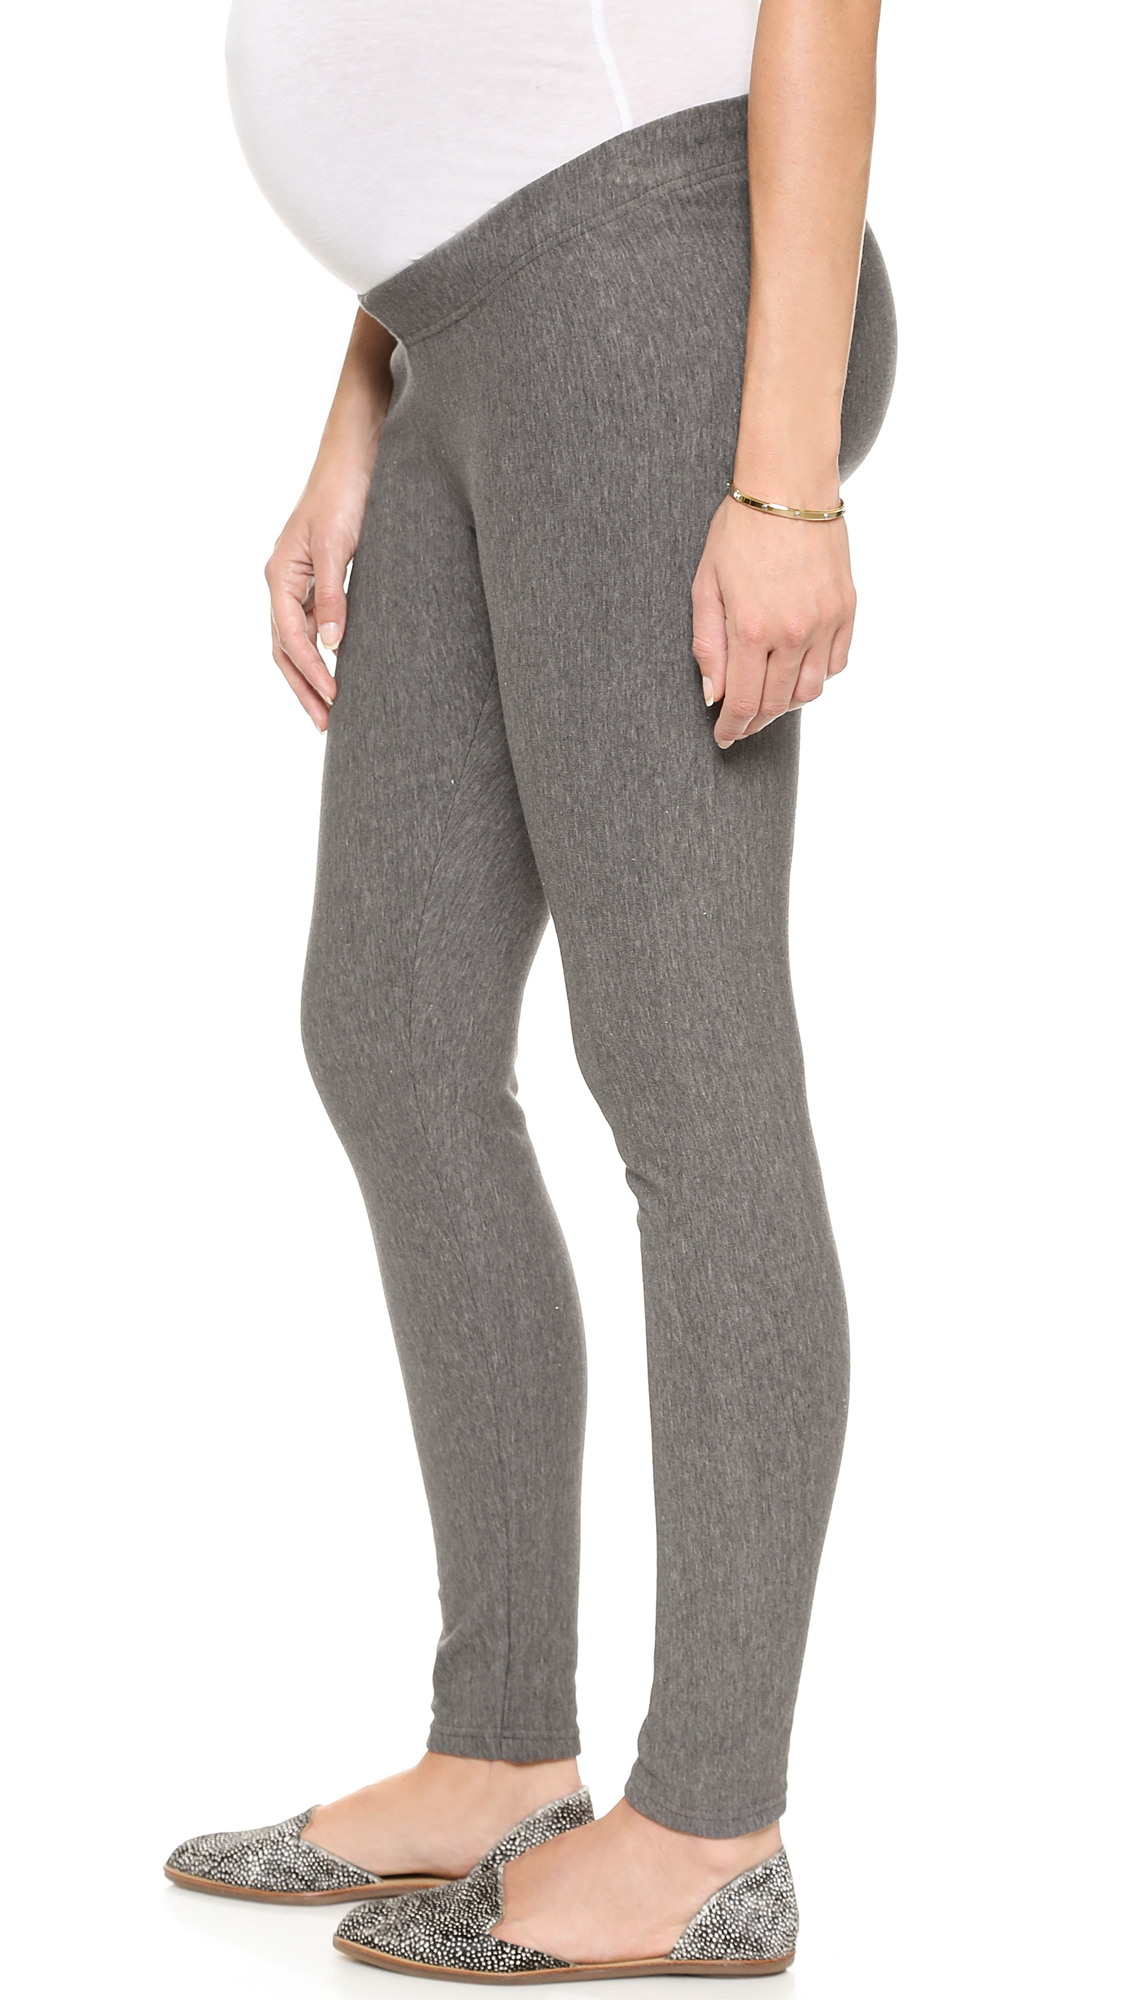 6fe97d158b356 Plush Fleece Maternity Leggings | SHOPBOP